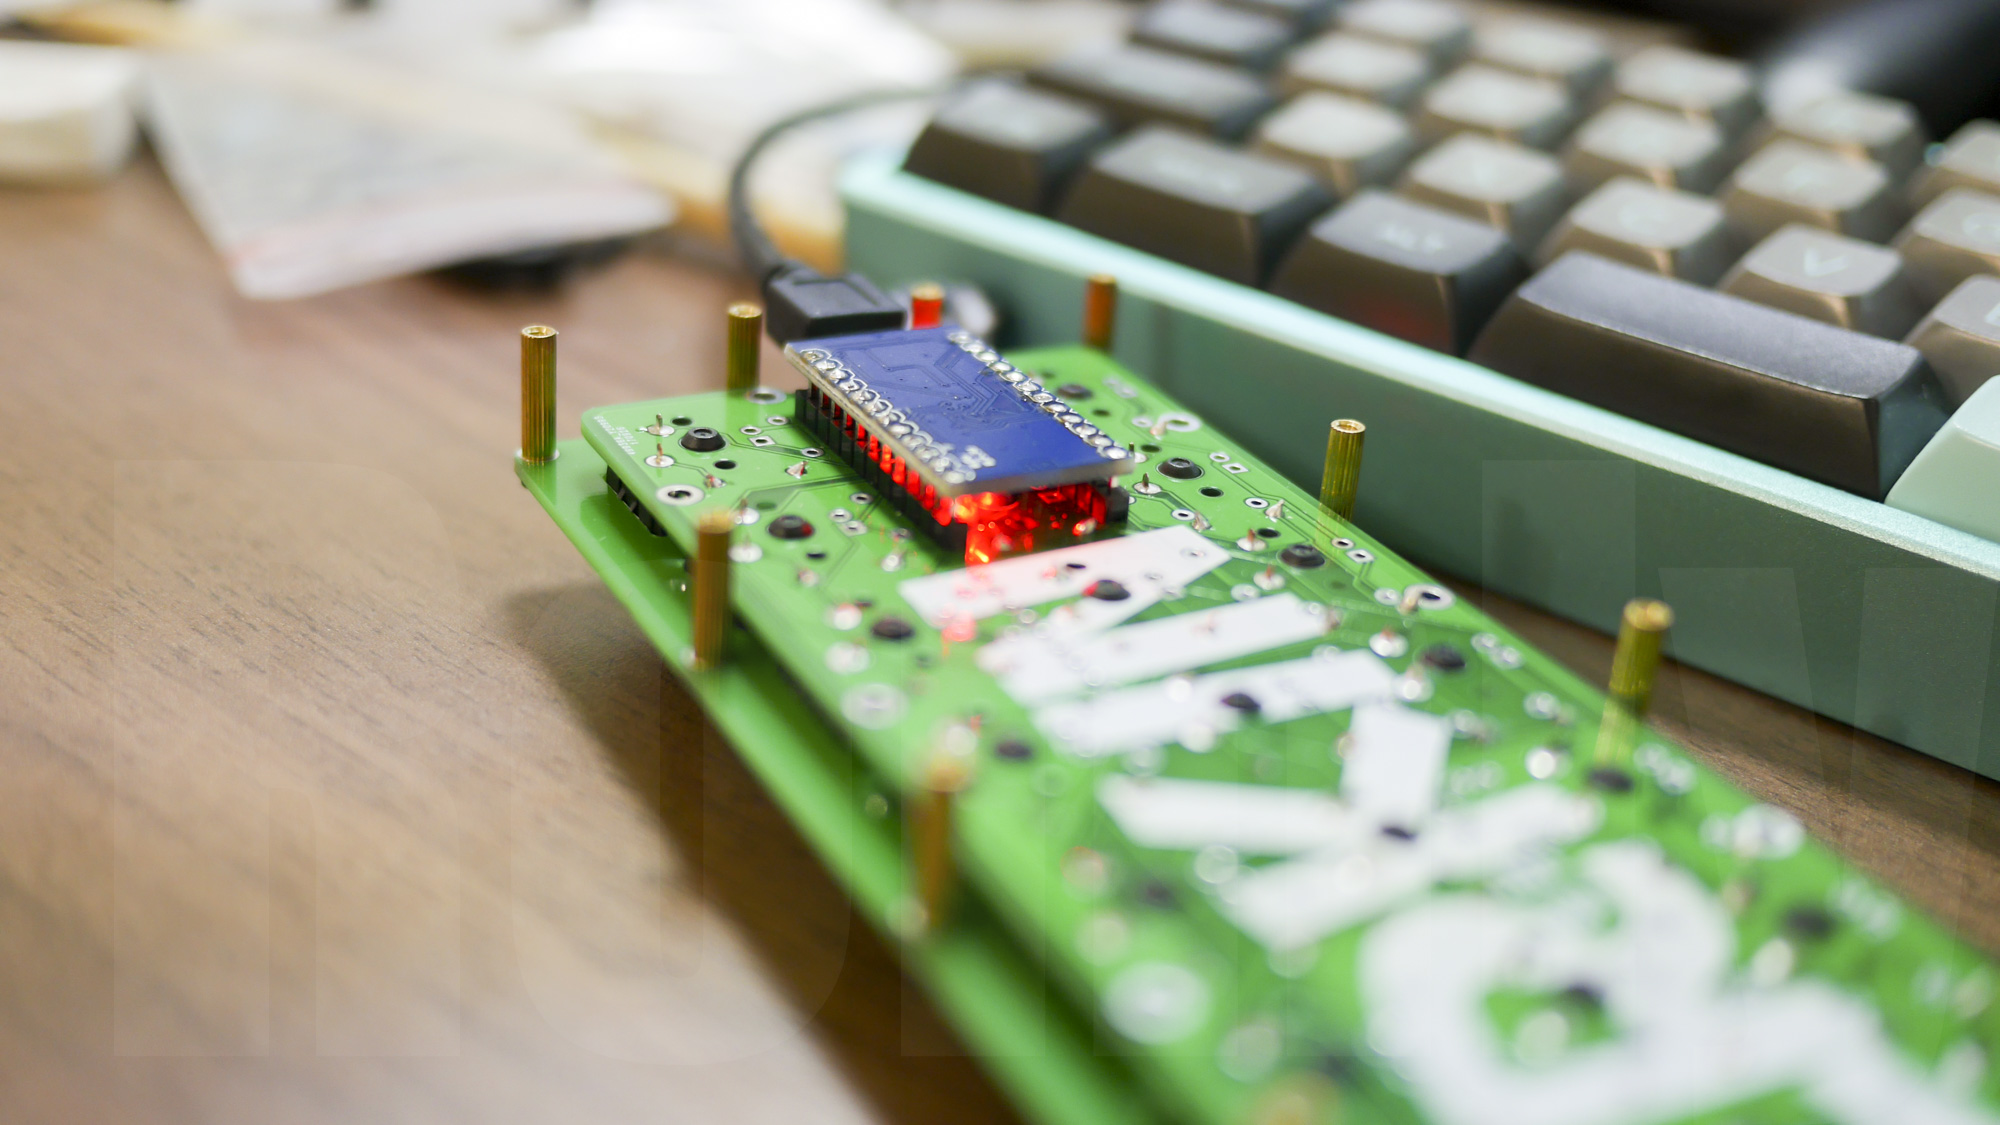 How to flash Gherkin firmware